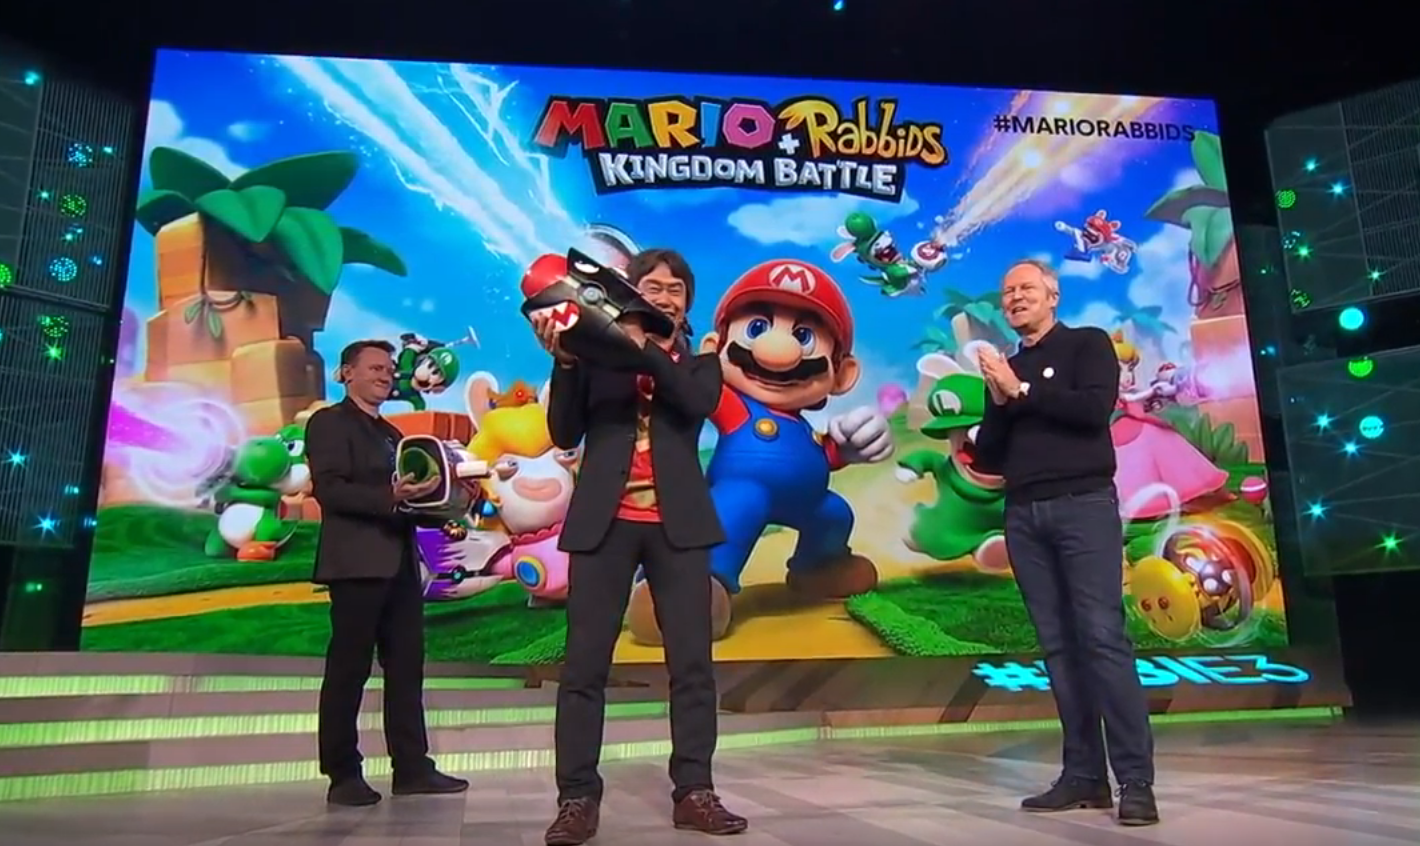 Ubisoft and Nintendo Partner Up To Create 'Mario Rabbids Kingdom Battle'